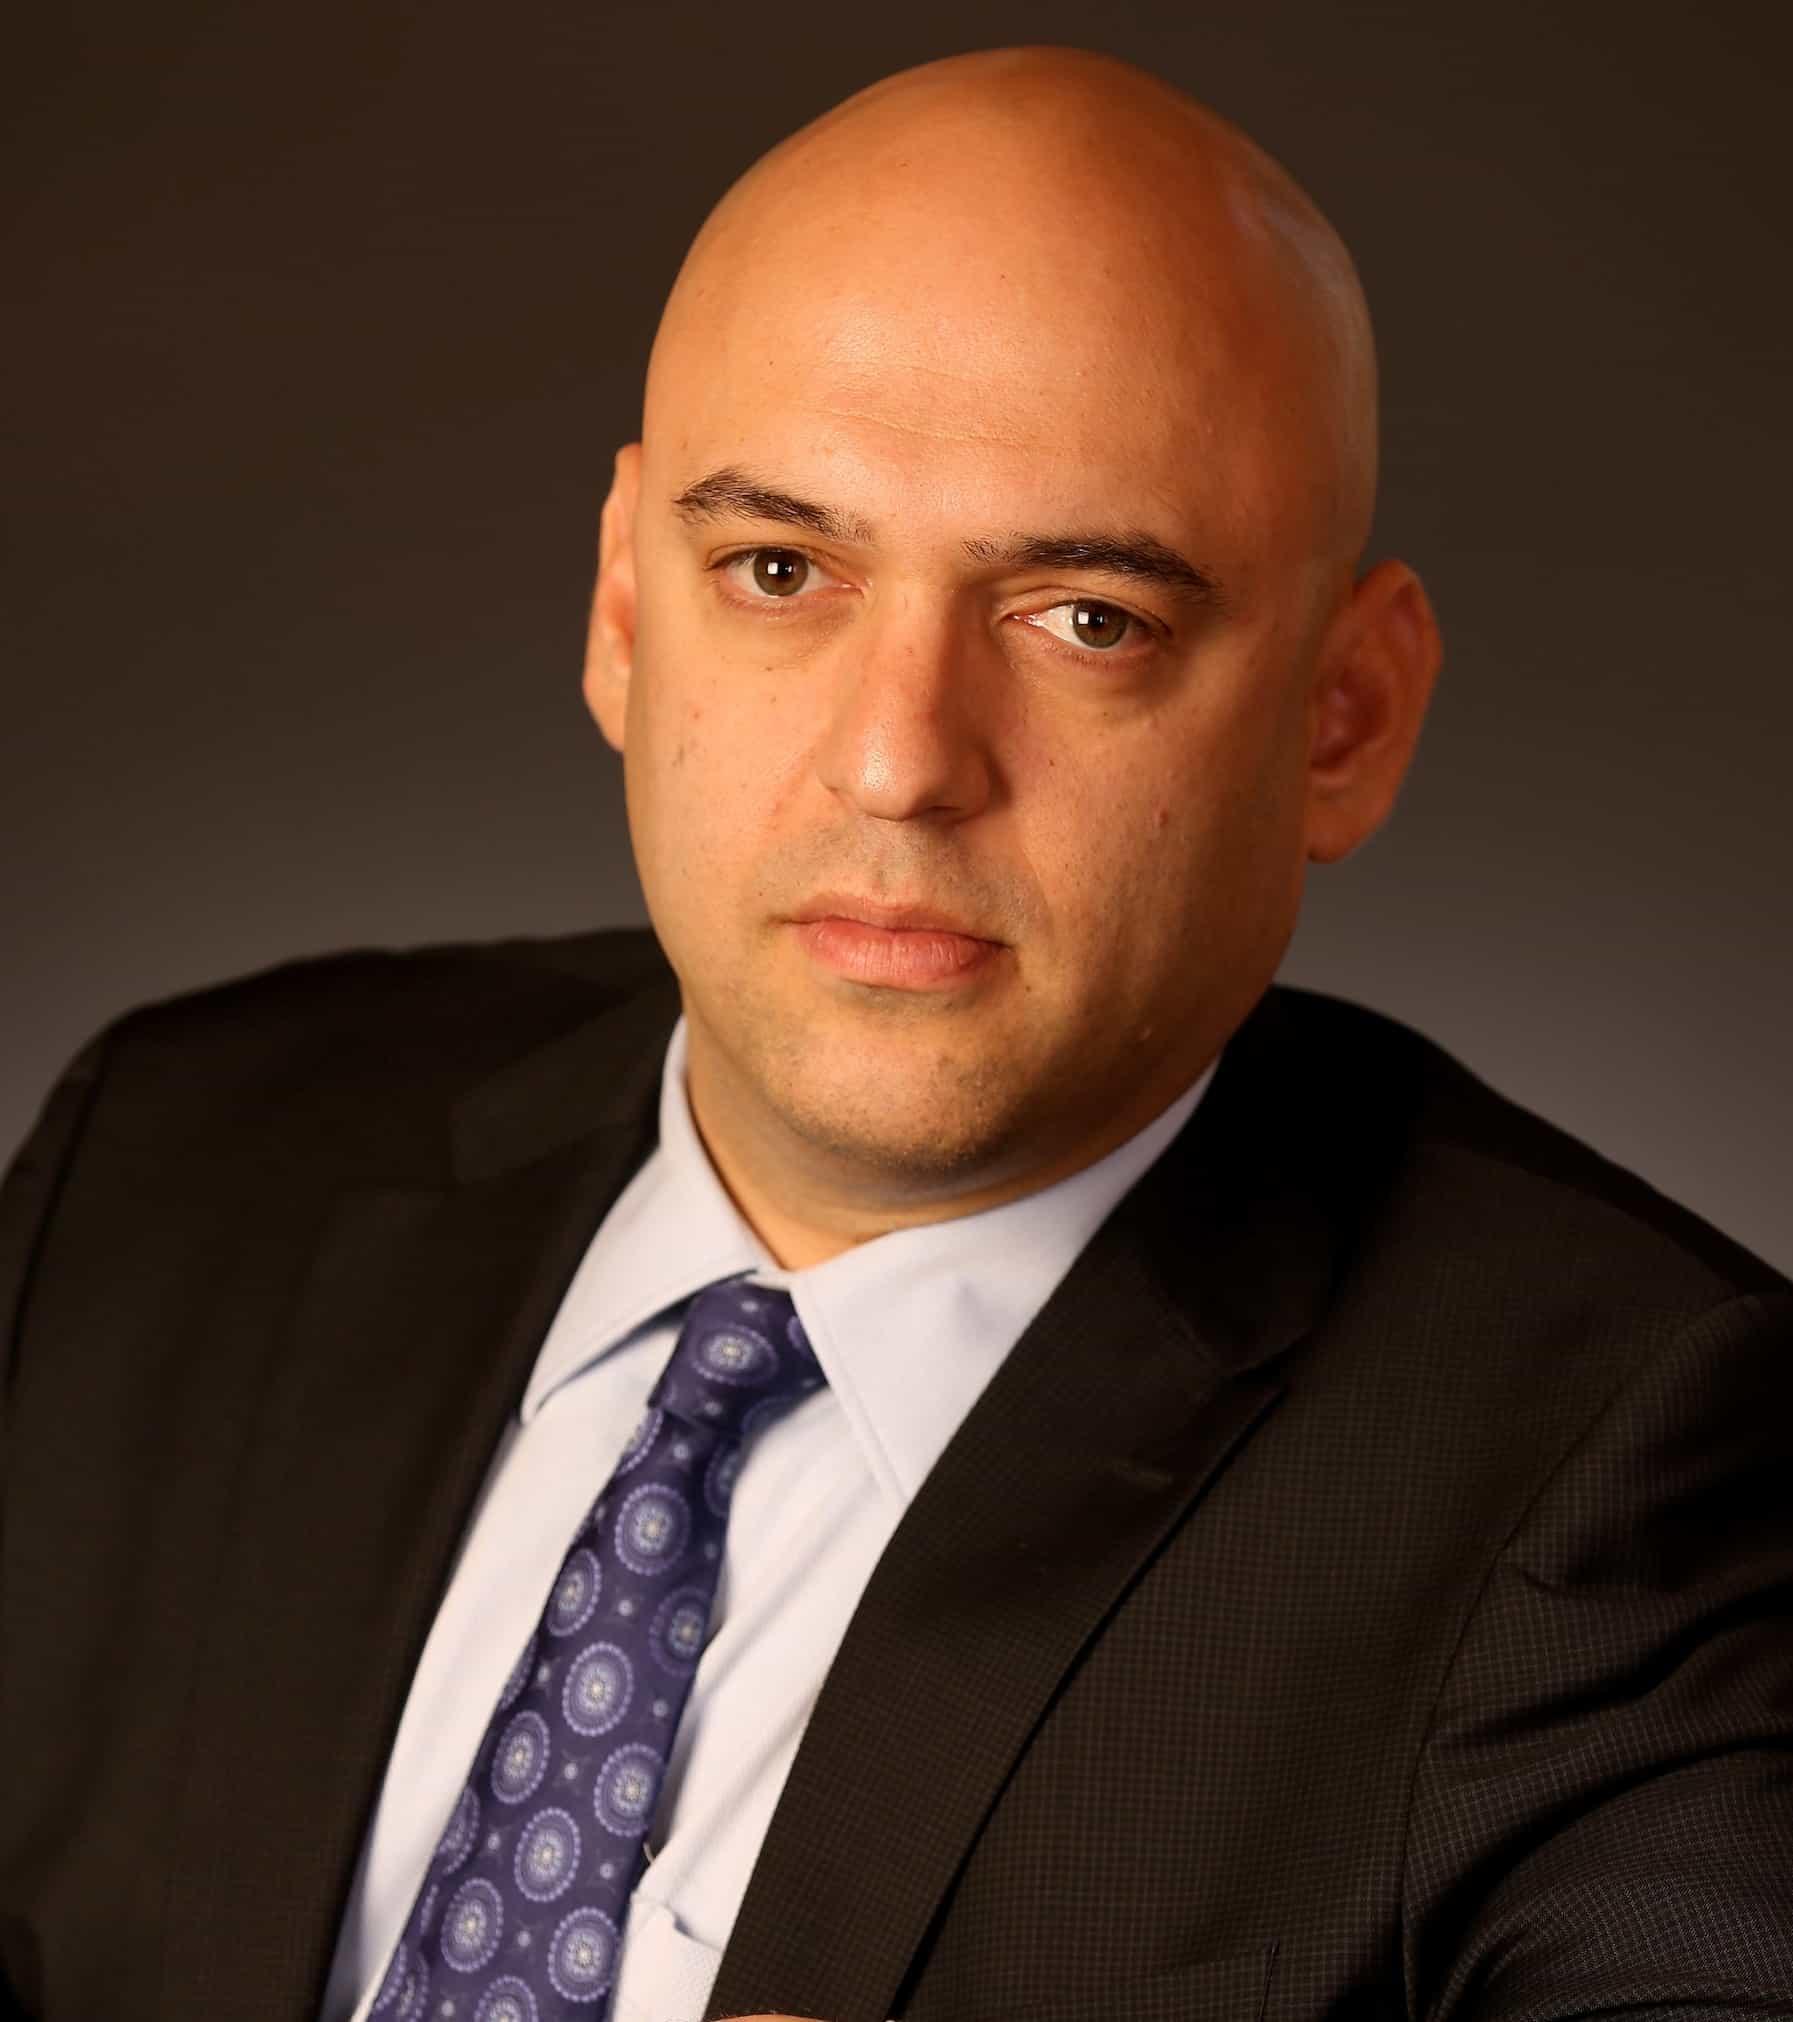 criminal-defense-attorney-los-angeles-lean What Is A Civil Bench Warrant